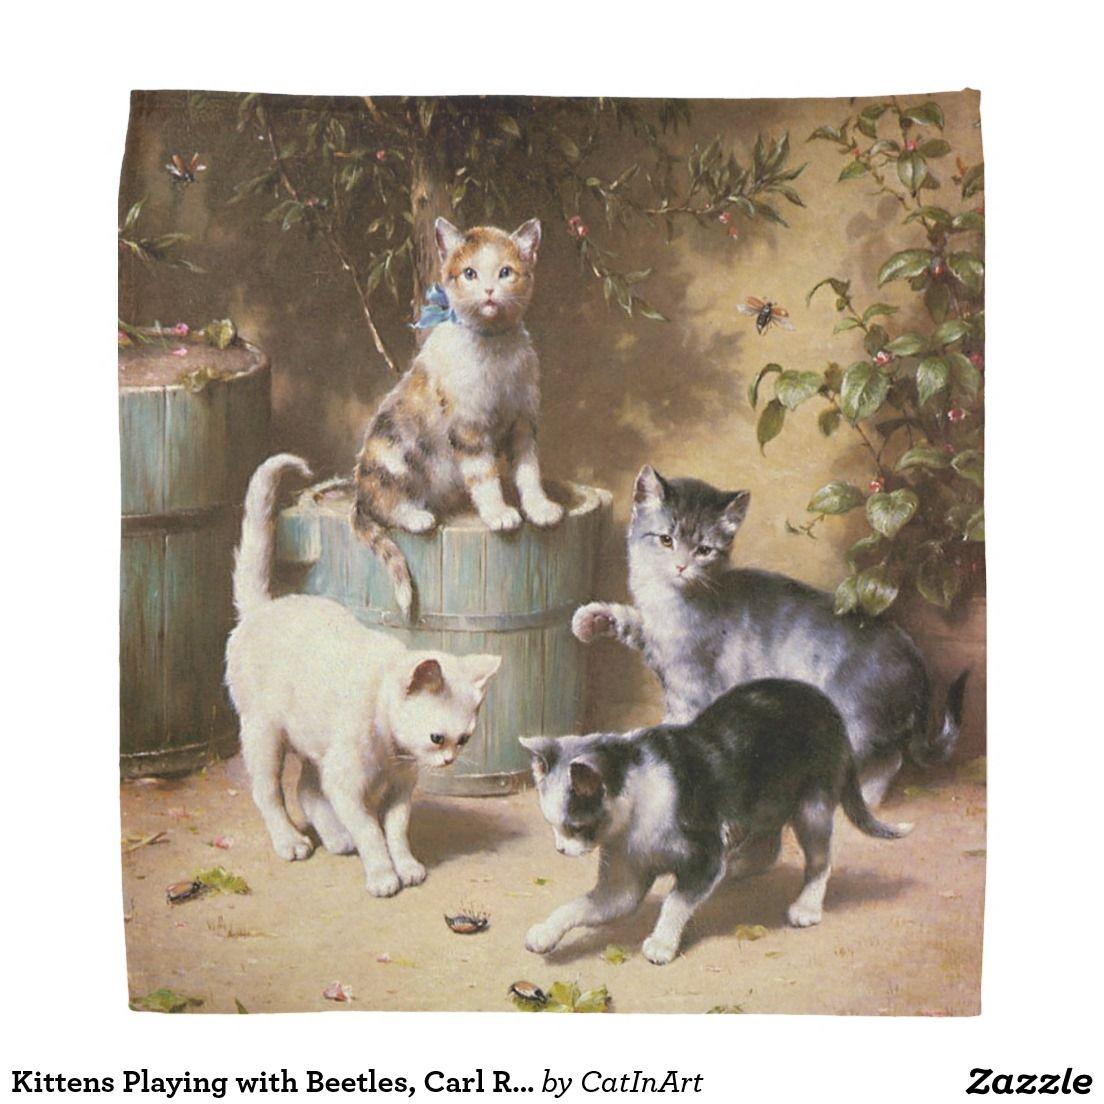 Kittens Playing With Beetles Carl Reichert Bandana Cat Painting Pet Artist Kittens Playing